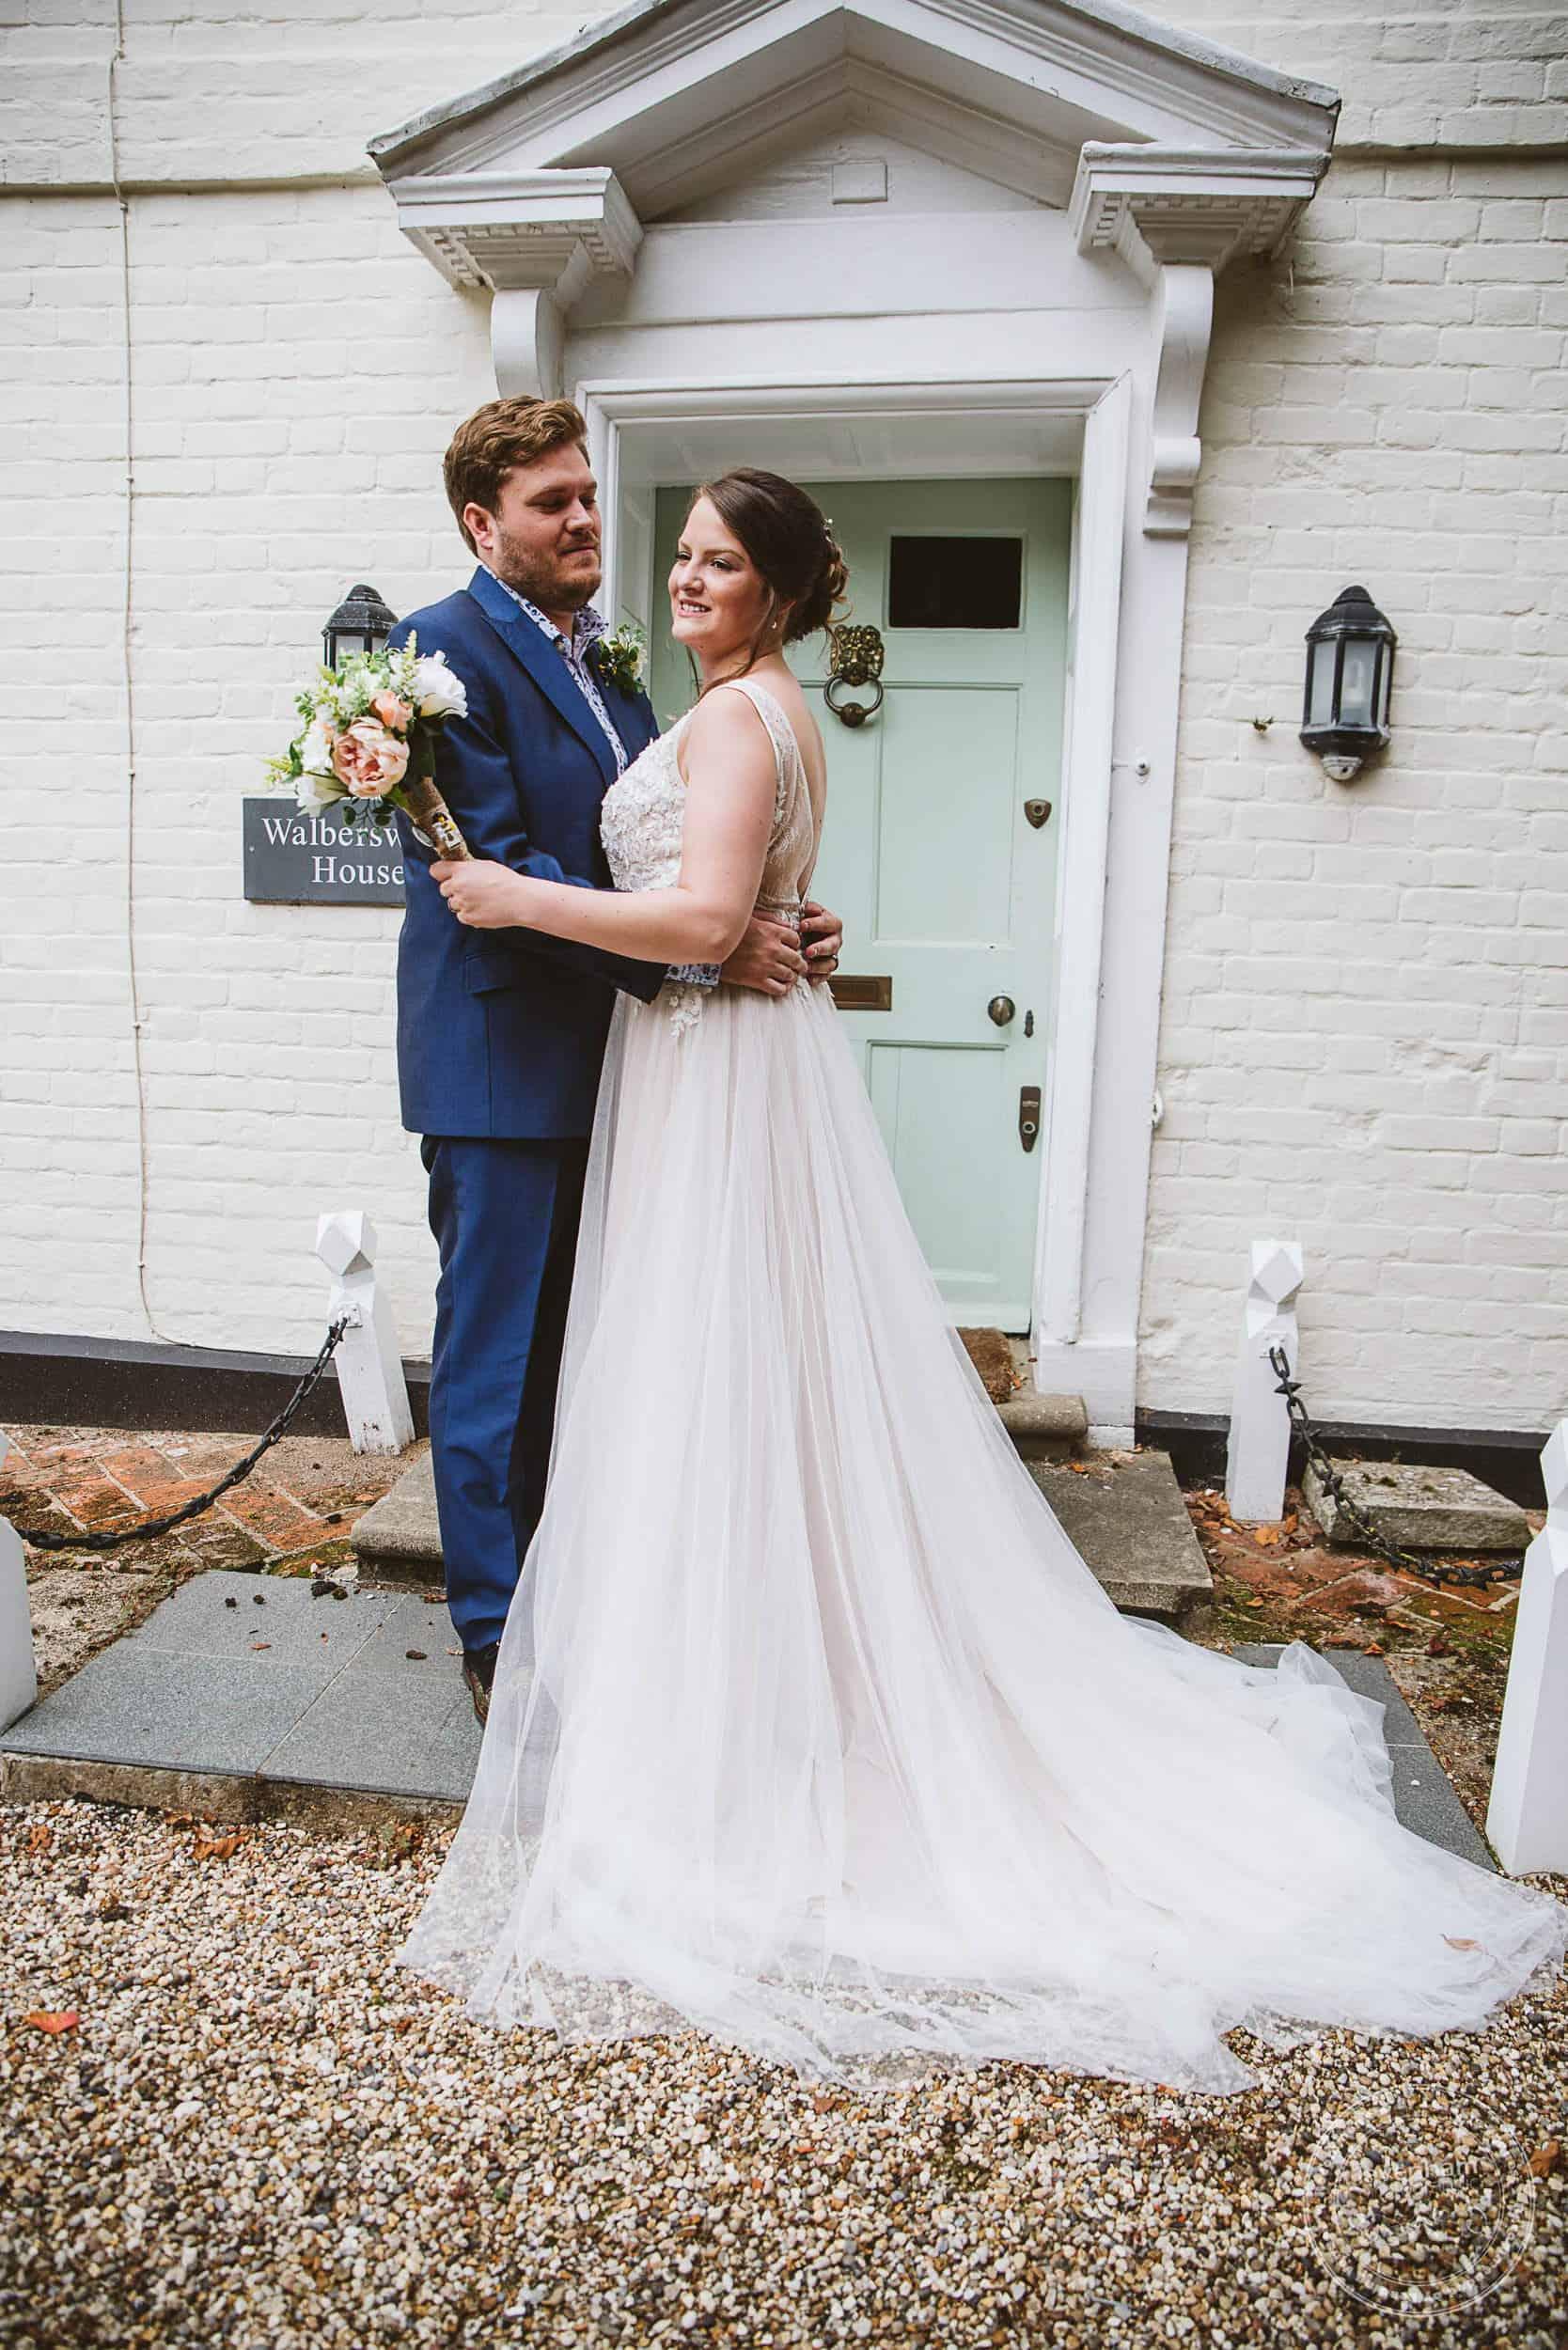 180818 Marks Hall Wedding Photography Lavenham Photographic 076